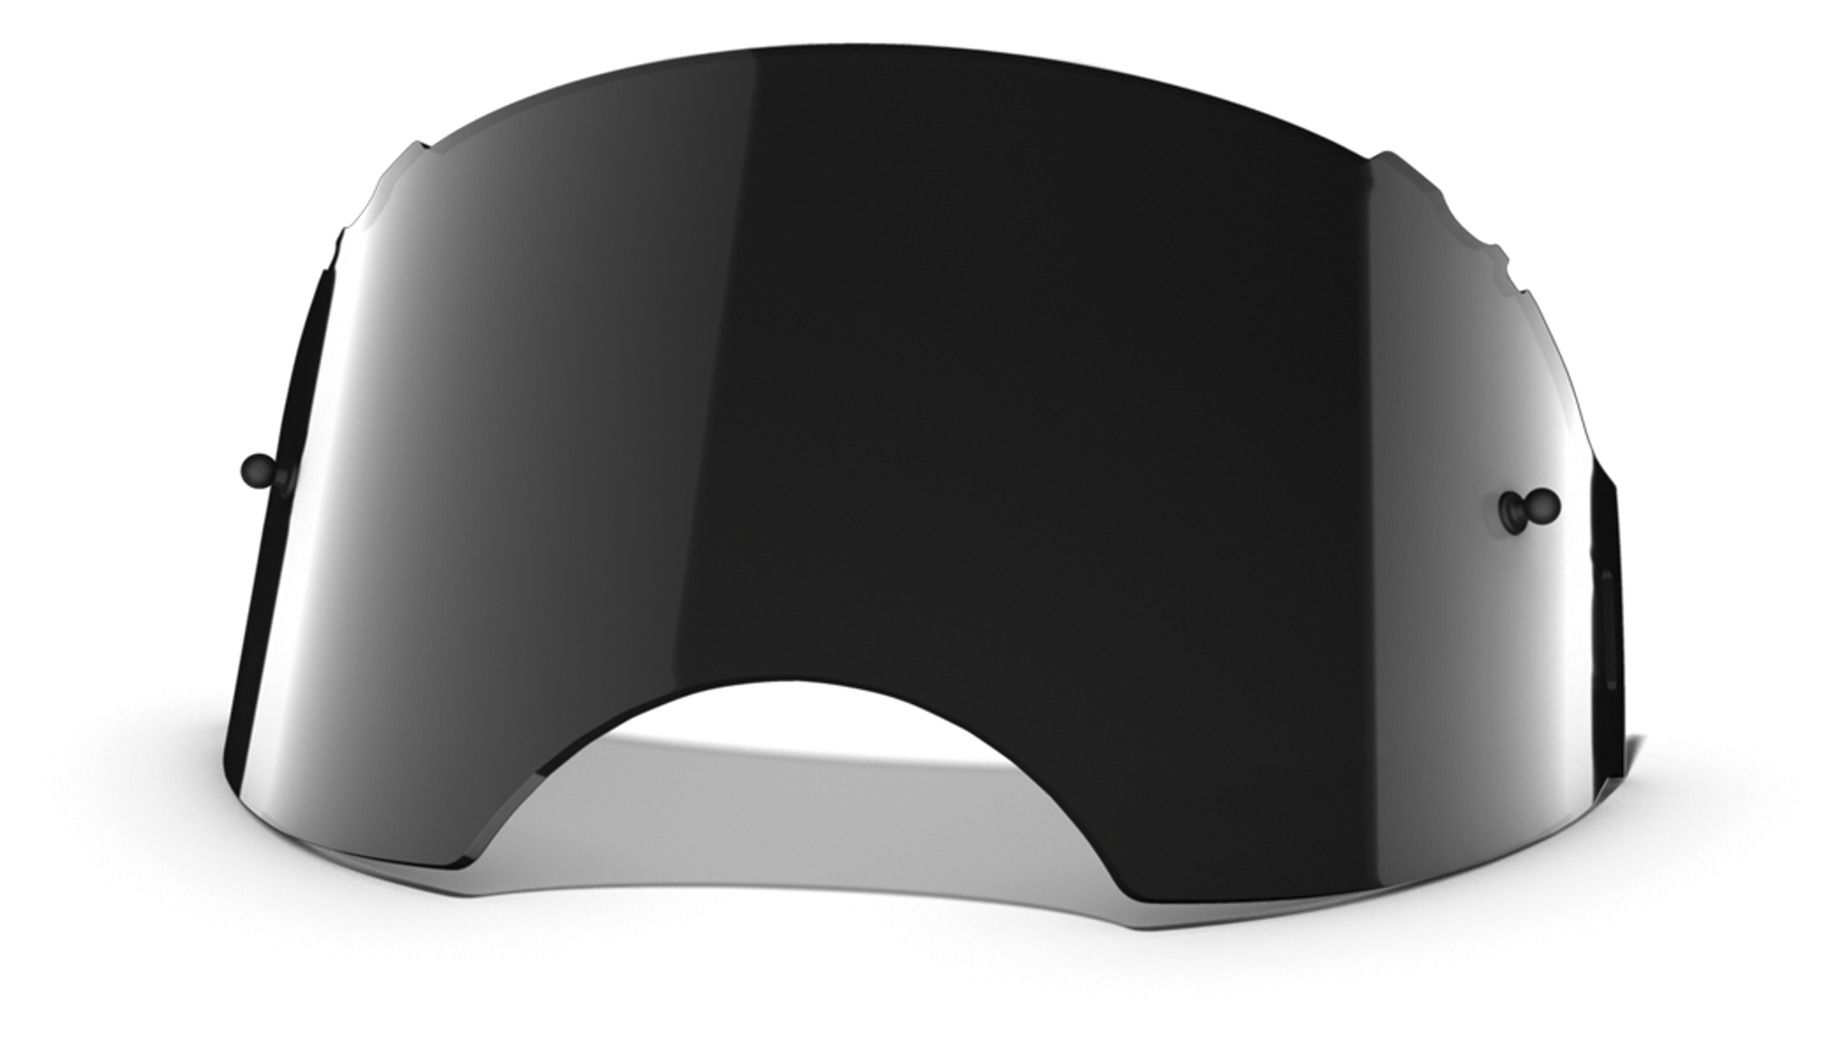 oakley airbrake mx lens protector shield